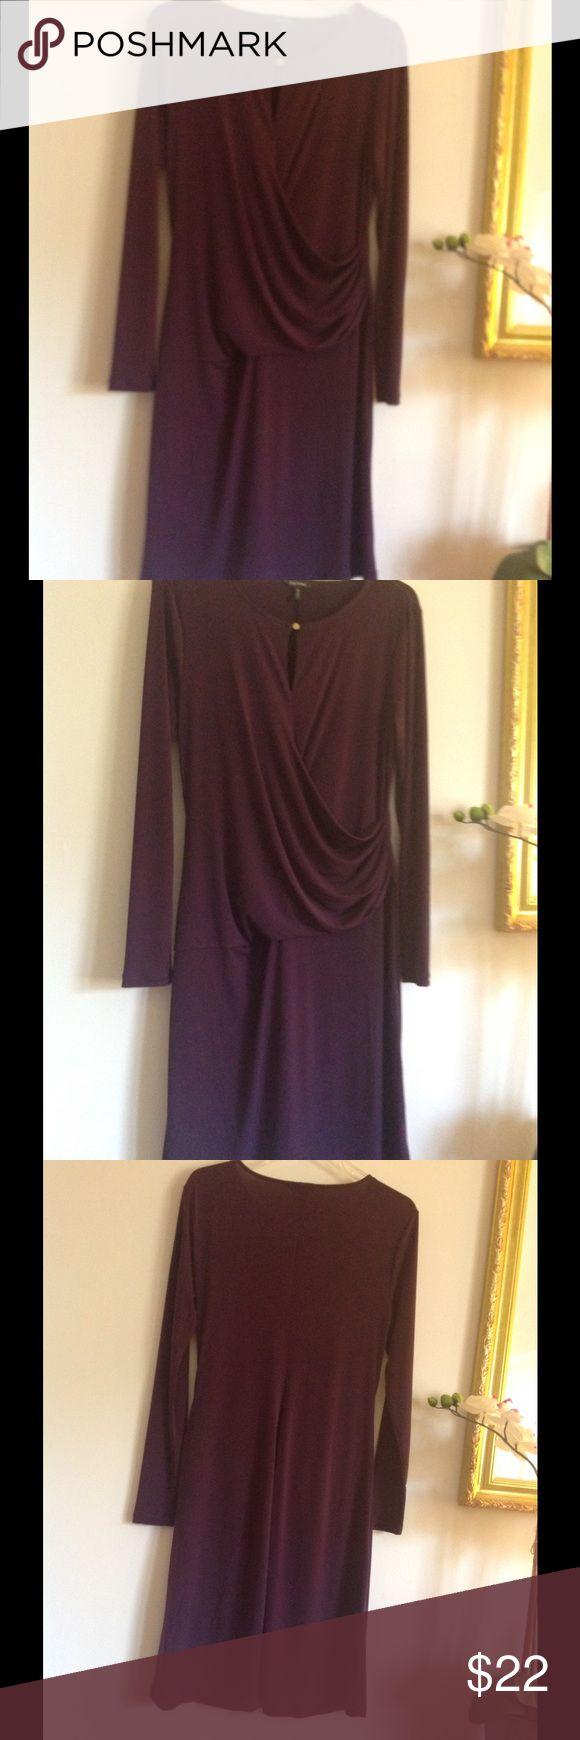 Cool bodycon dress daisy fuentes dress daisy fuentes purple long